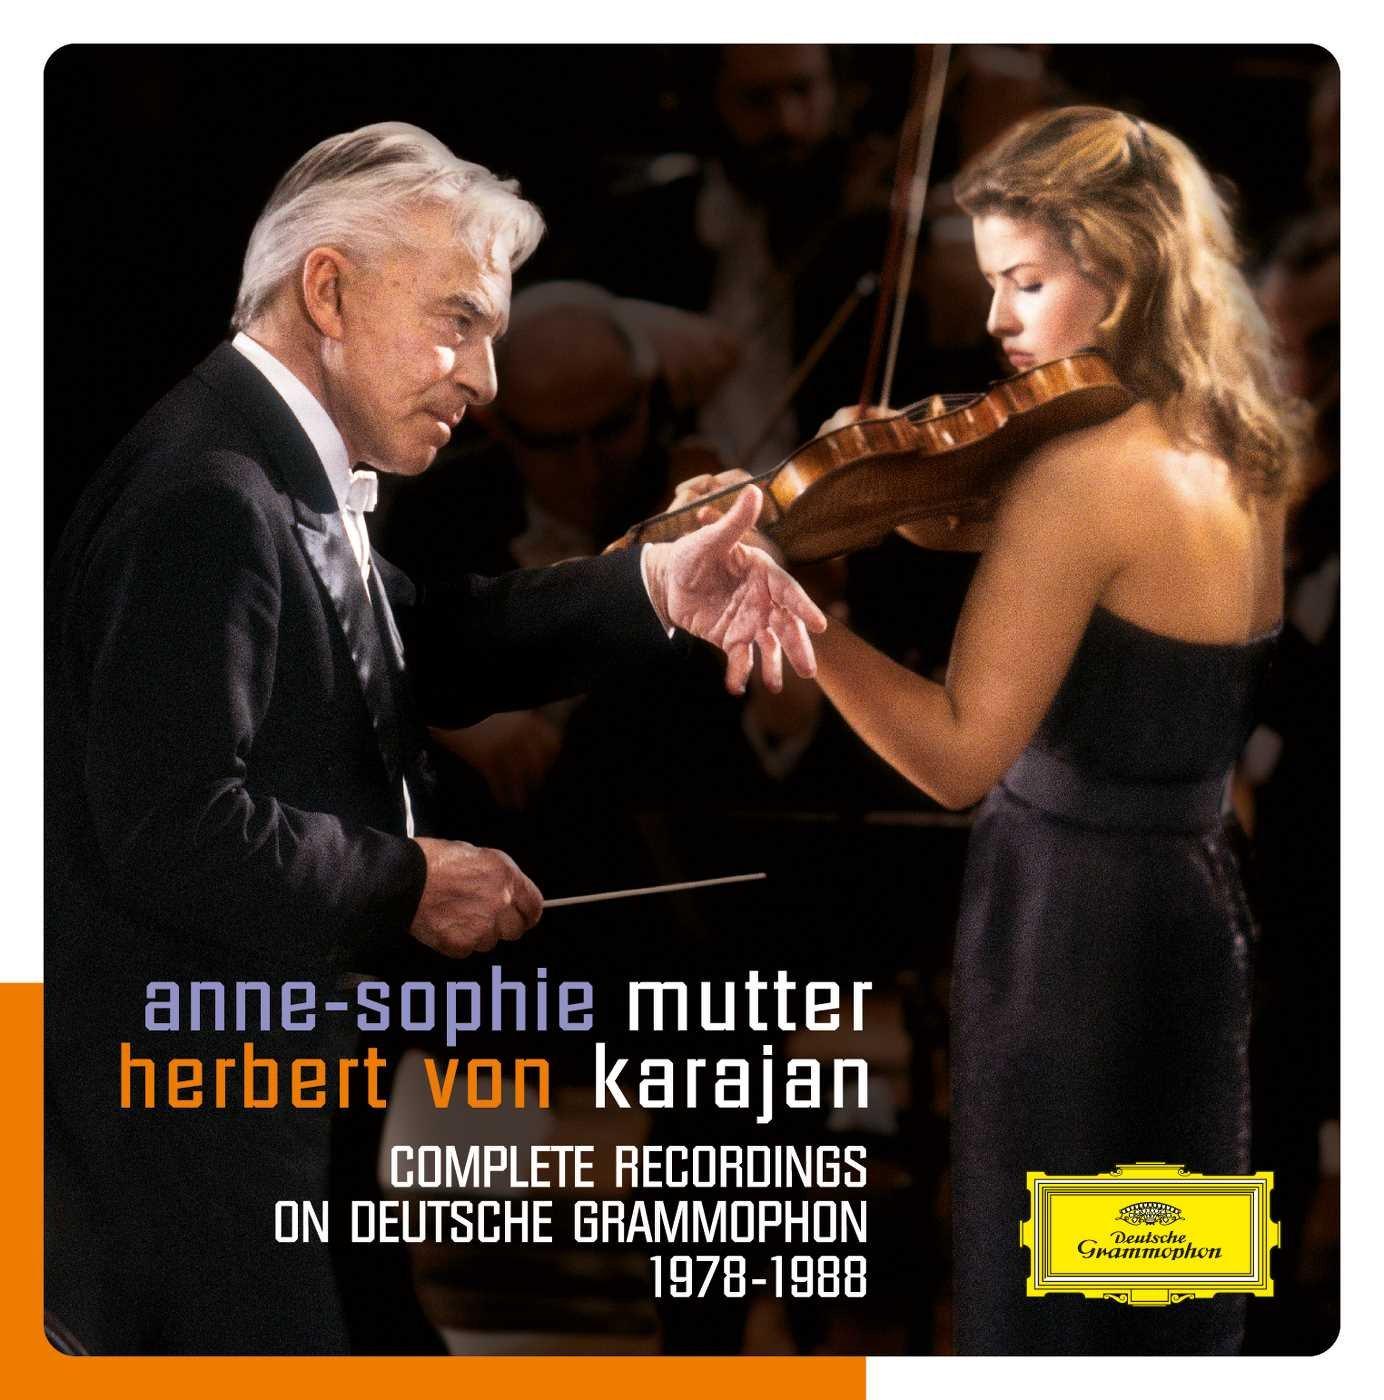 Mutter - Karajan: Complete Recordings on Deutsche Grammophon (1978-1988) by DEUTSCHE GRAMMOPHON, VARI, BOX CLASSICA,